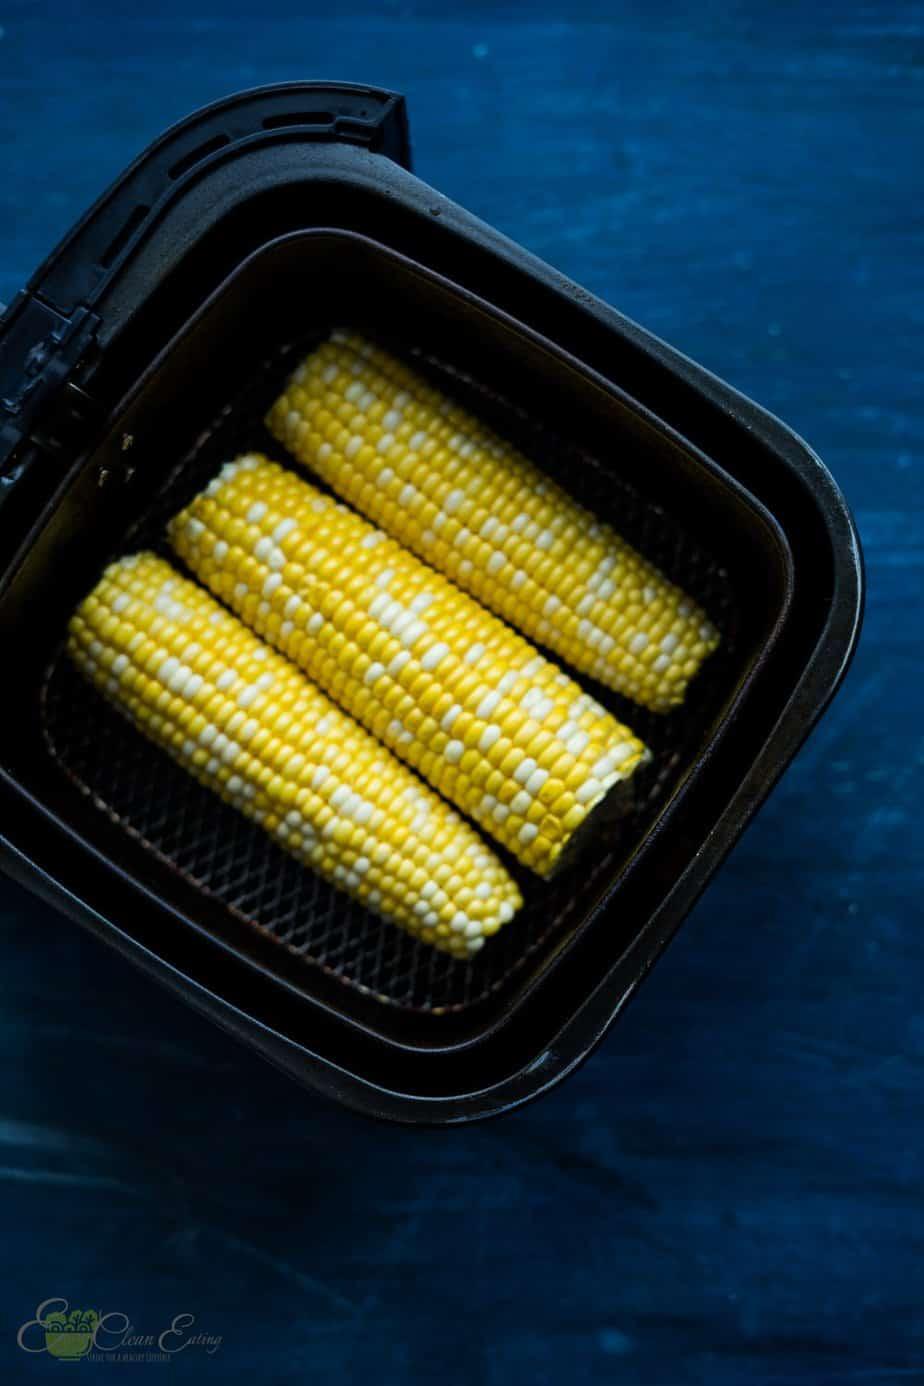 corn on the corn inside the air fryer basket